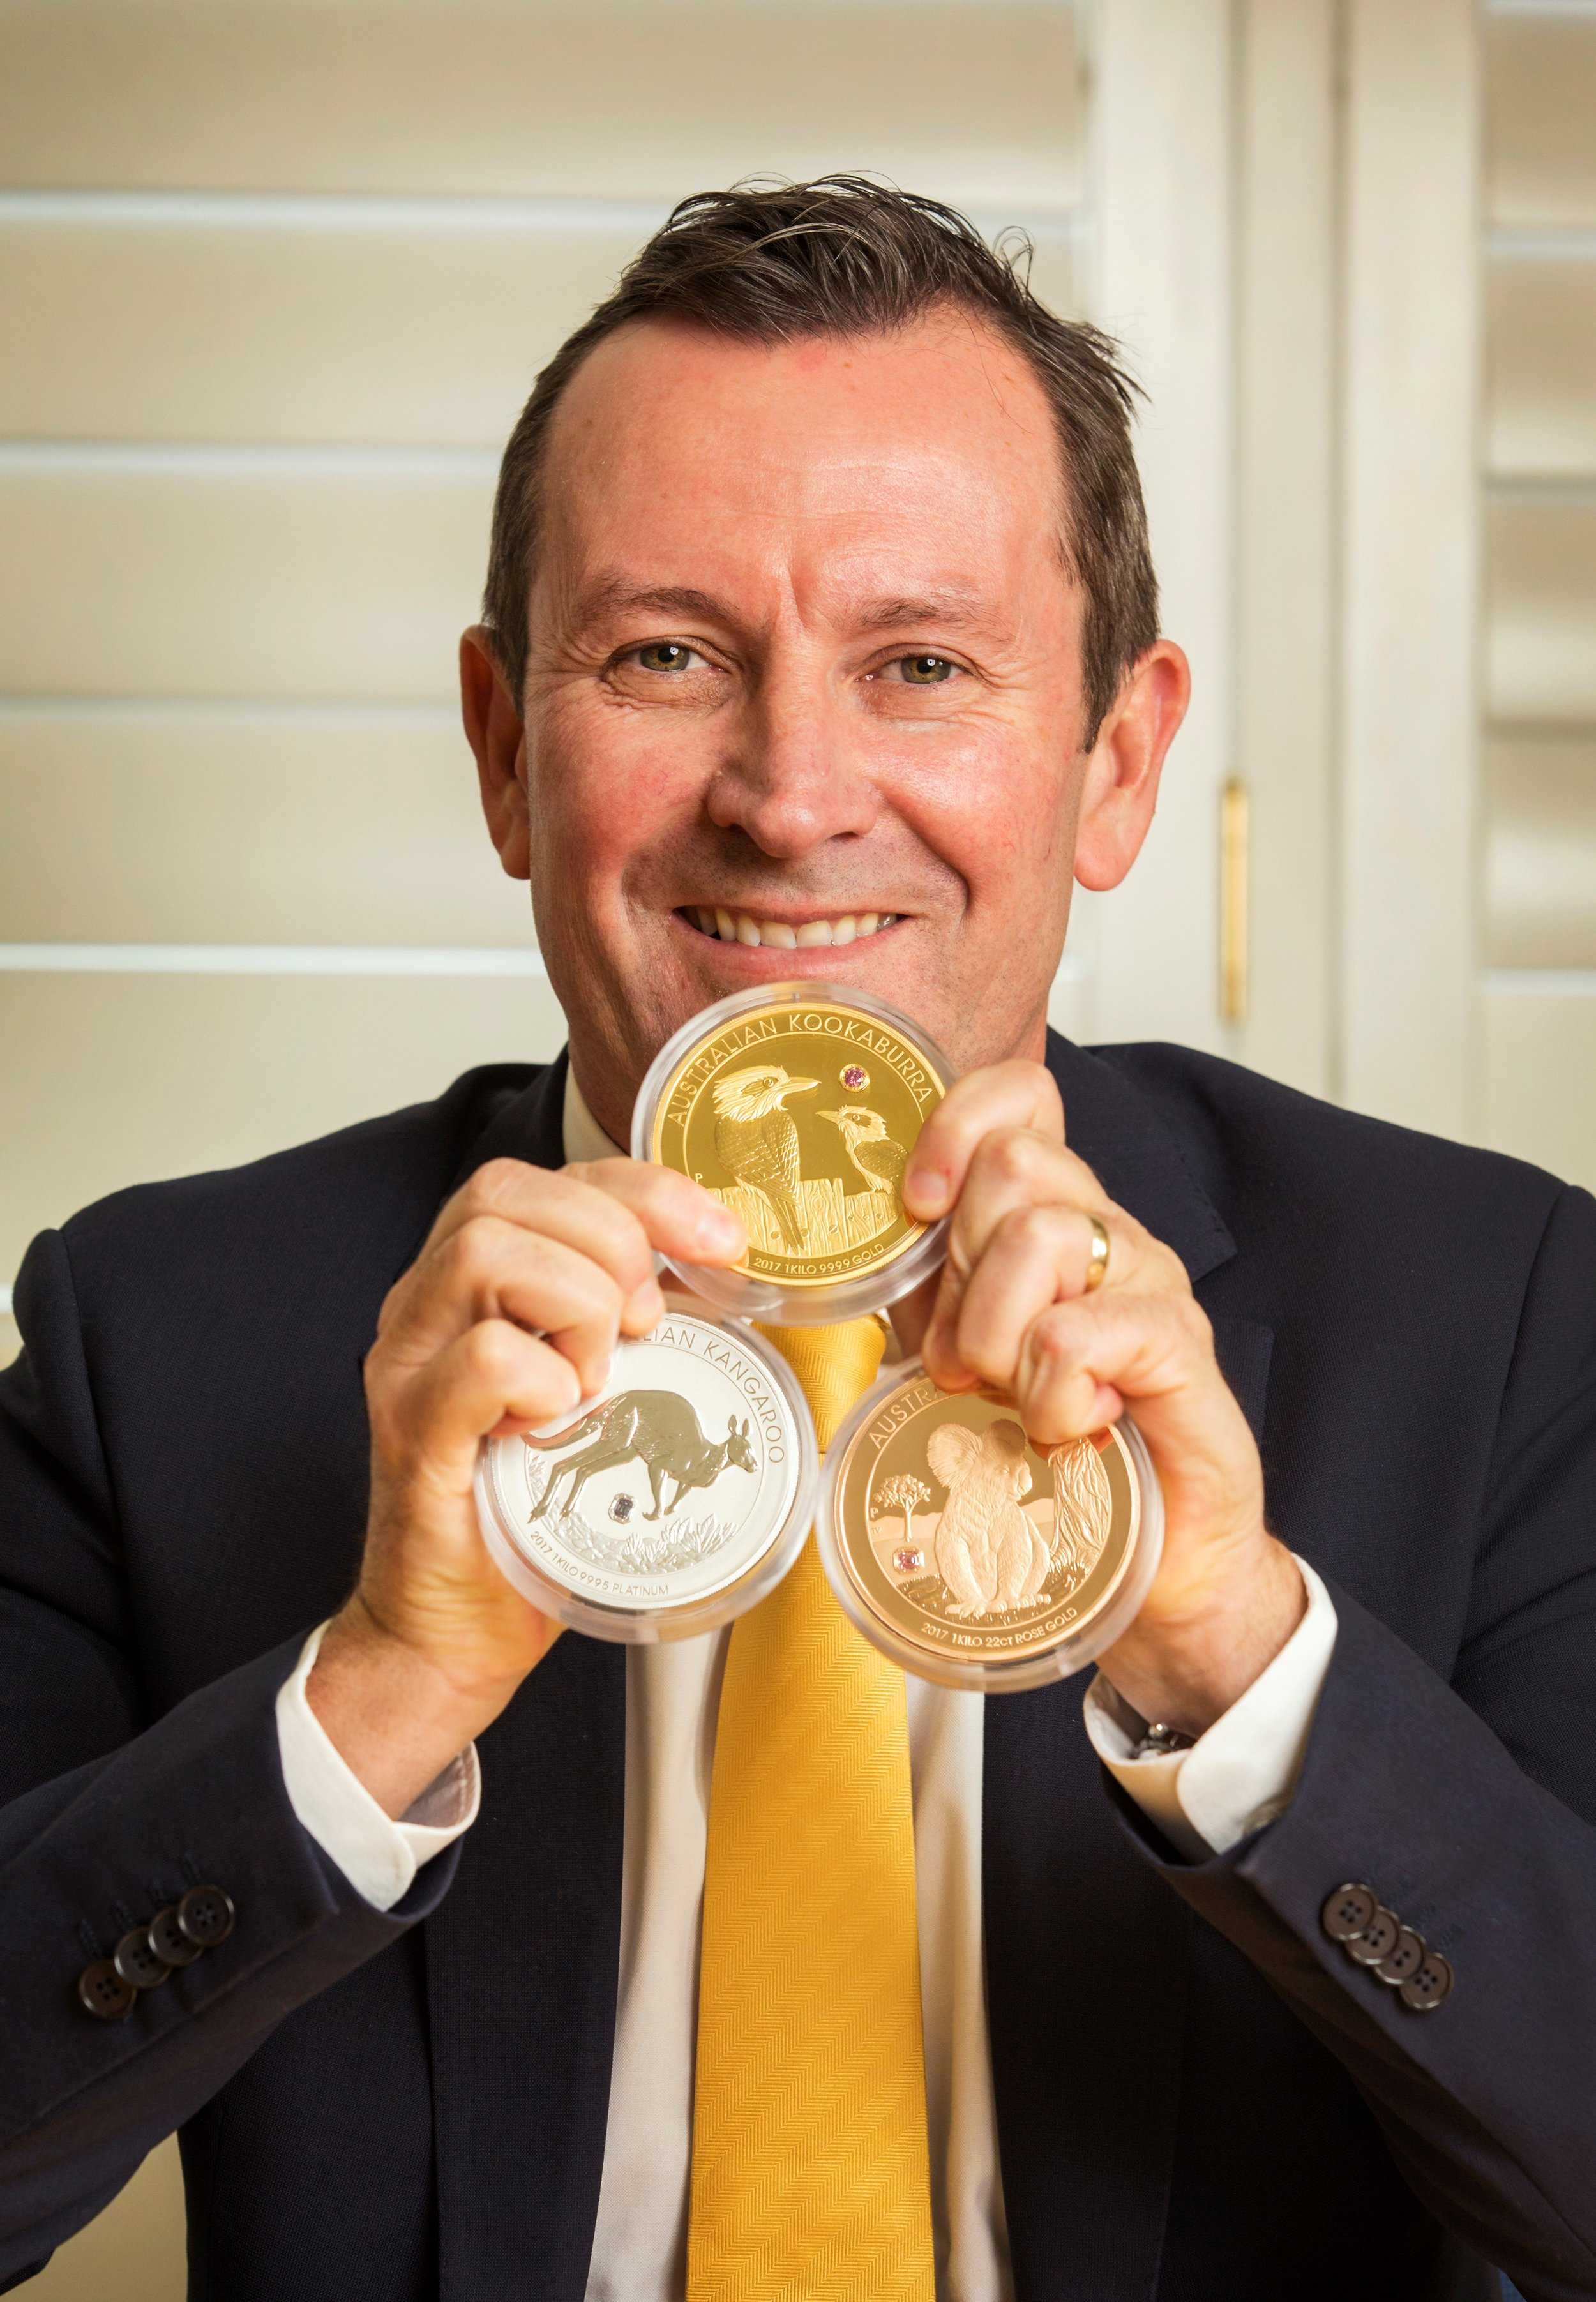 Honourable Mark McGowan MLA holding The Australian Trilogy